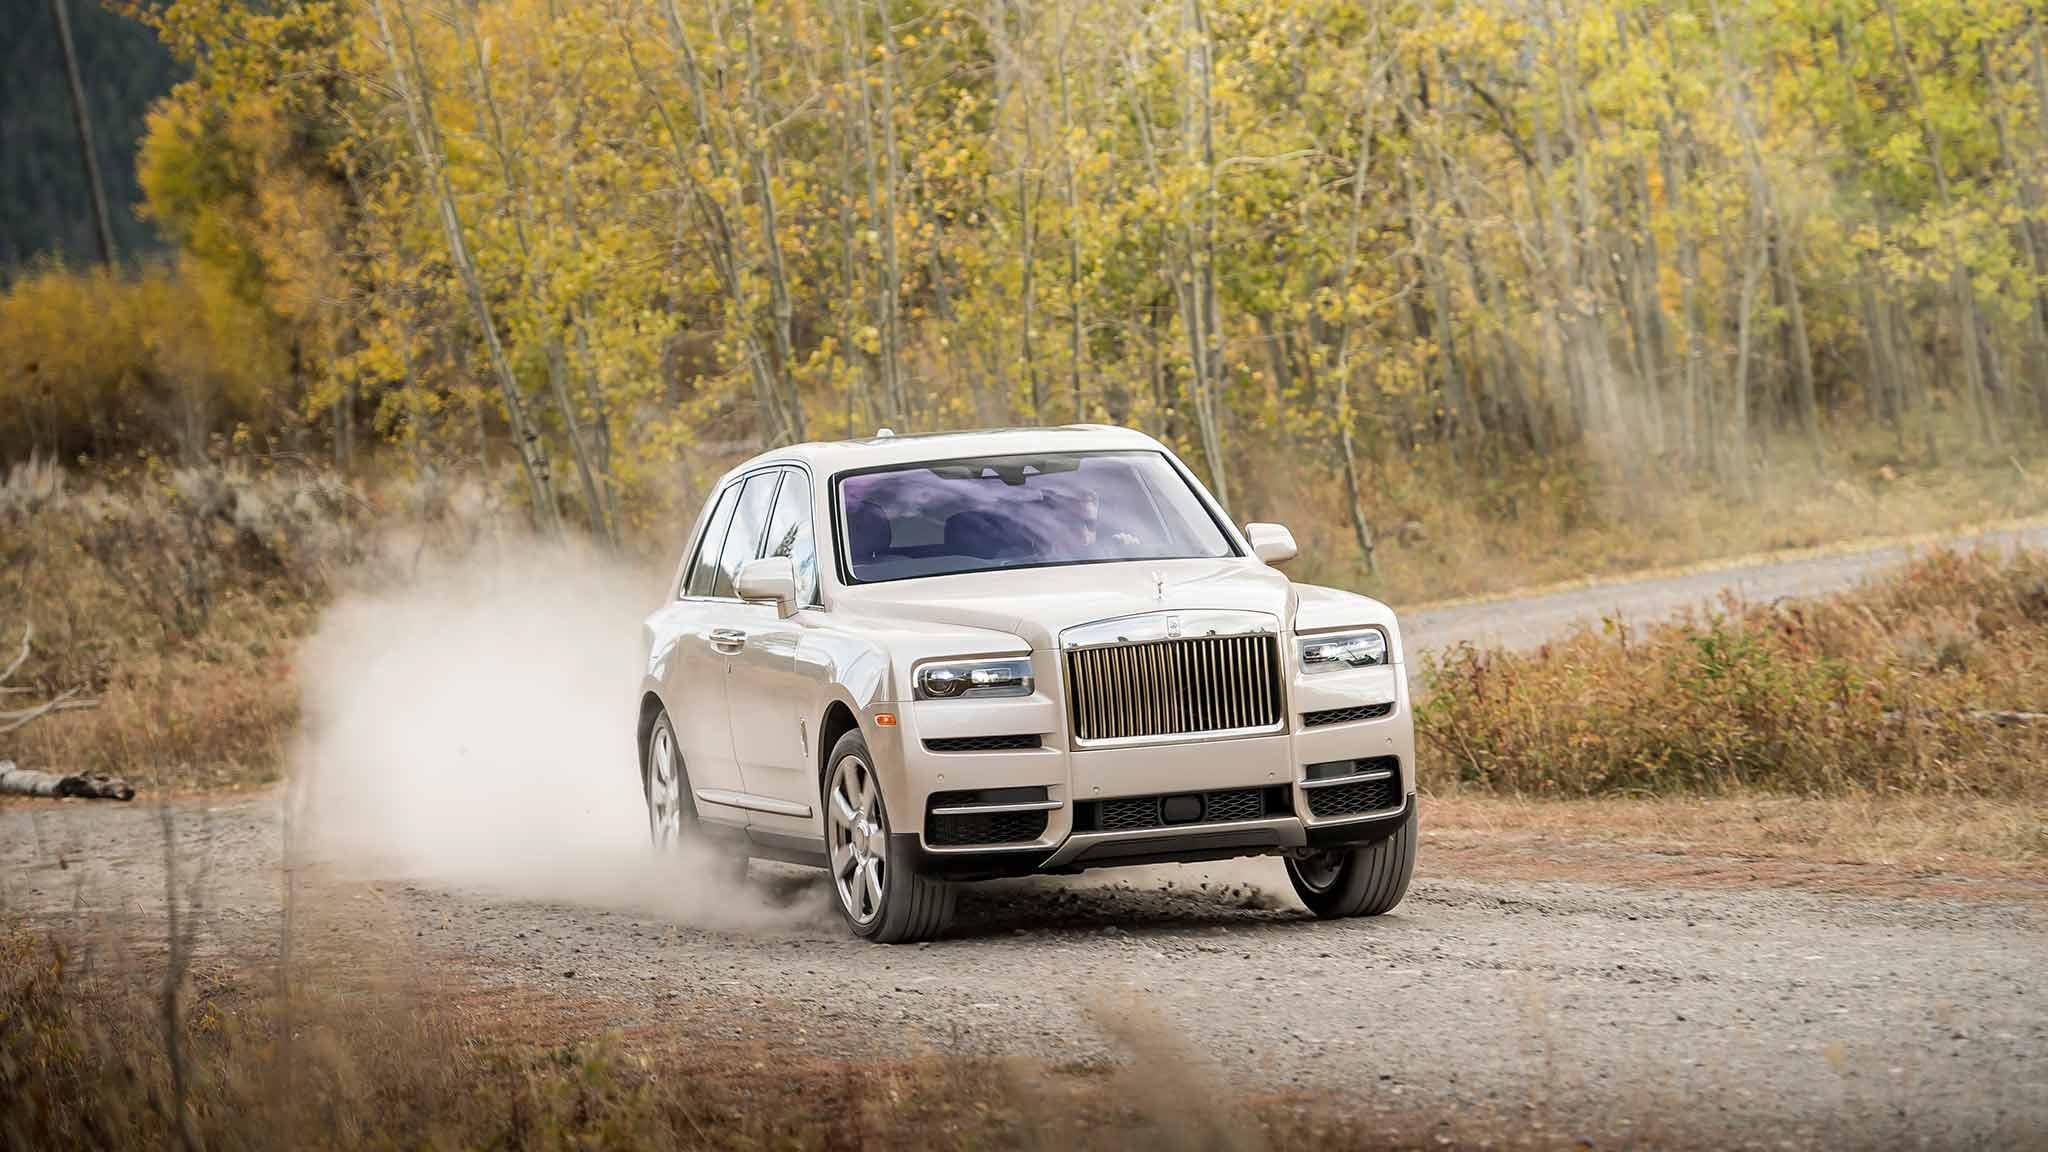 2019 Rolls Royce Cullinan Off Road Wallpapers Rolls Royce Cullinan Petra Gold 3155766 Hd Wallpaper Backgrounds Download